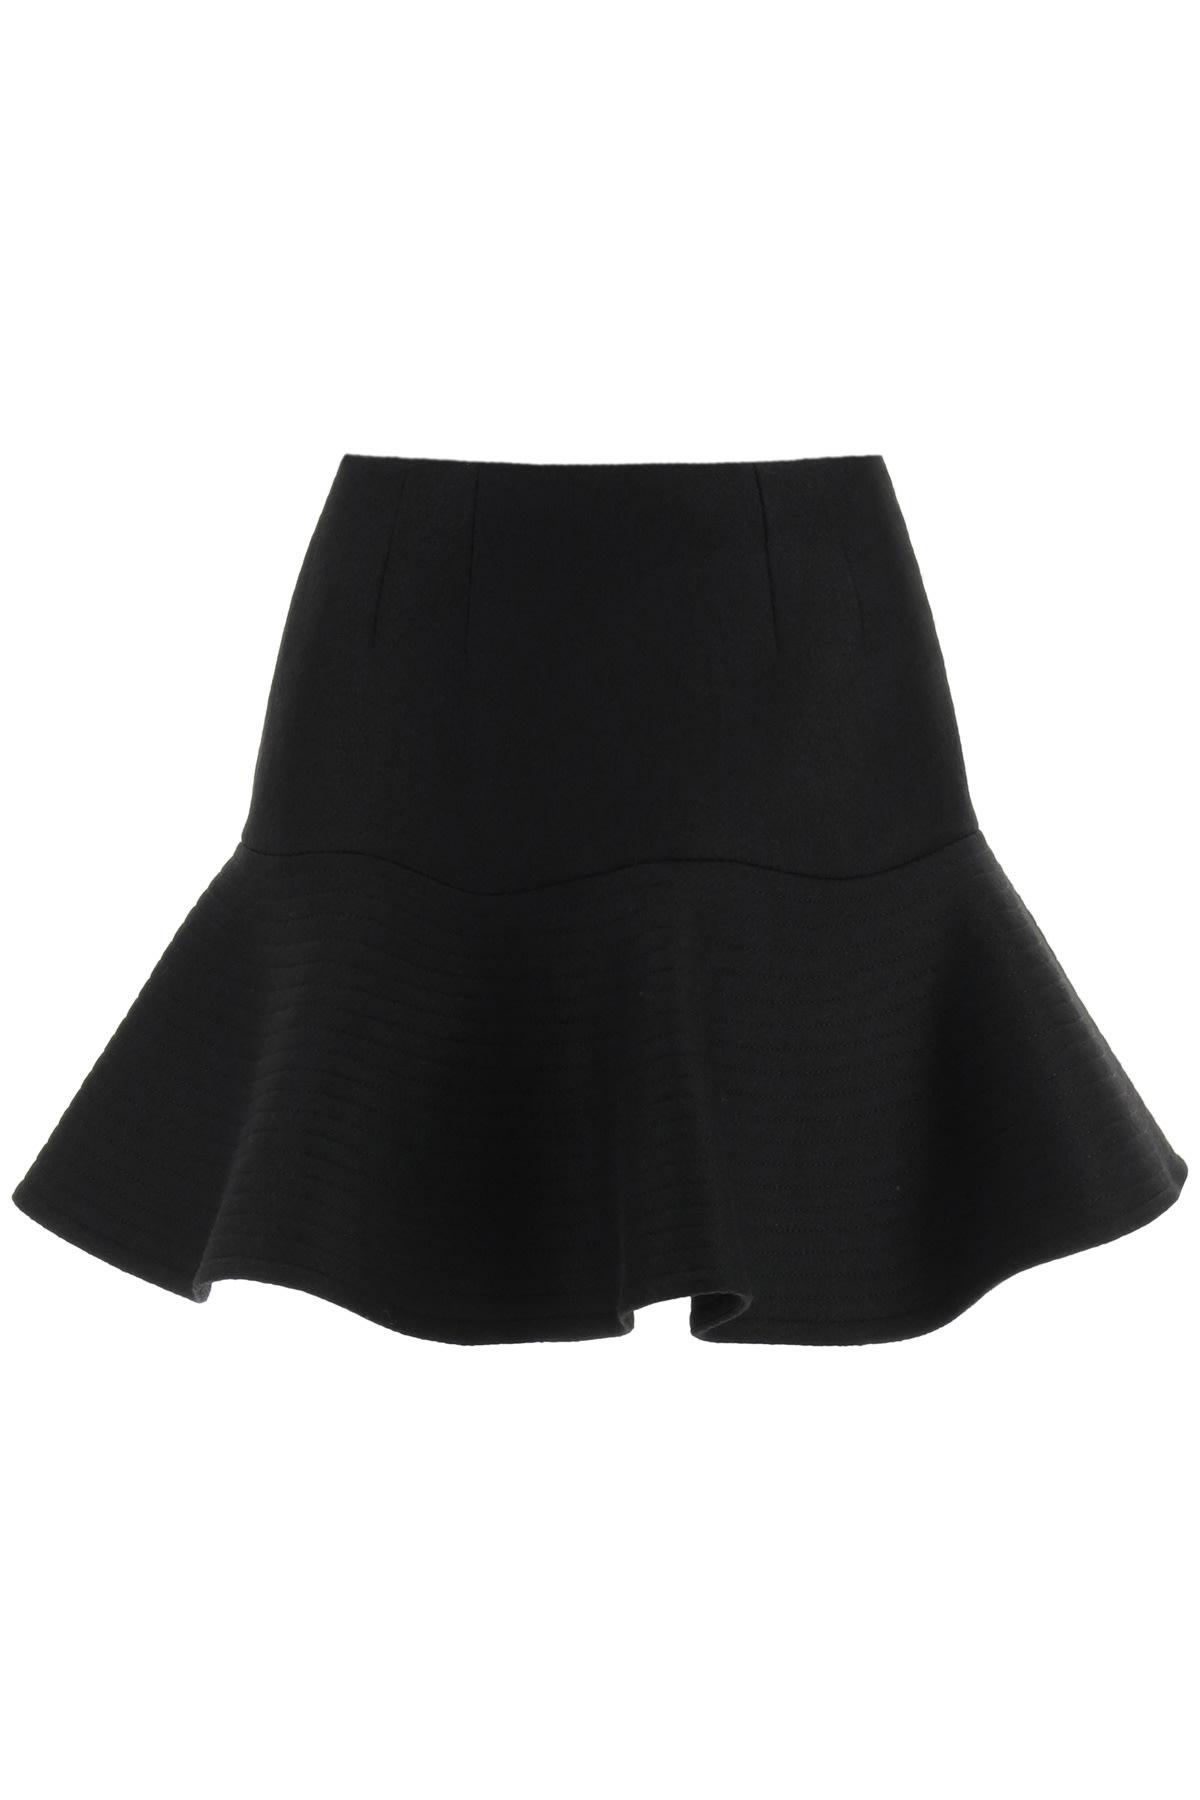 Patou 3d Mini Skirt In Boiled Wool